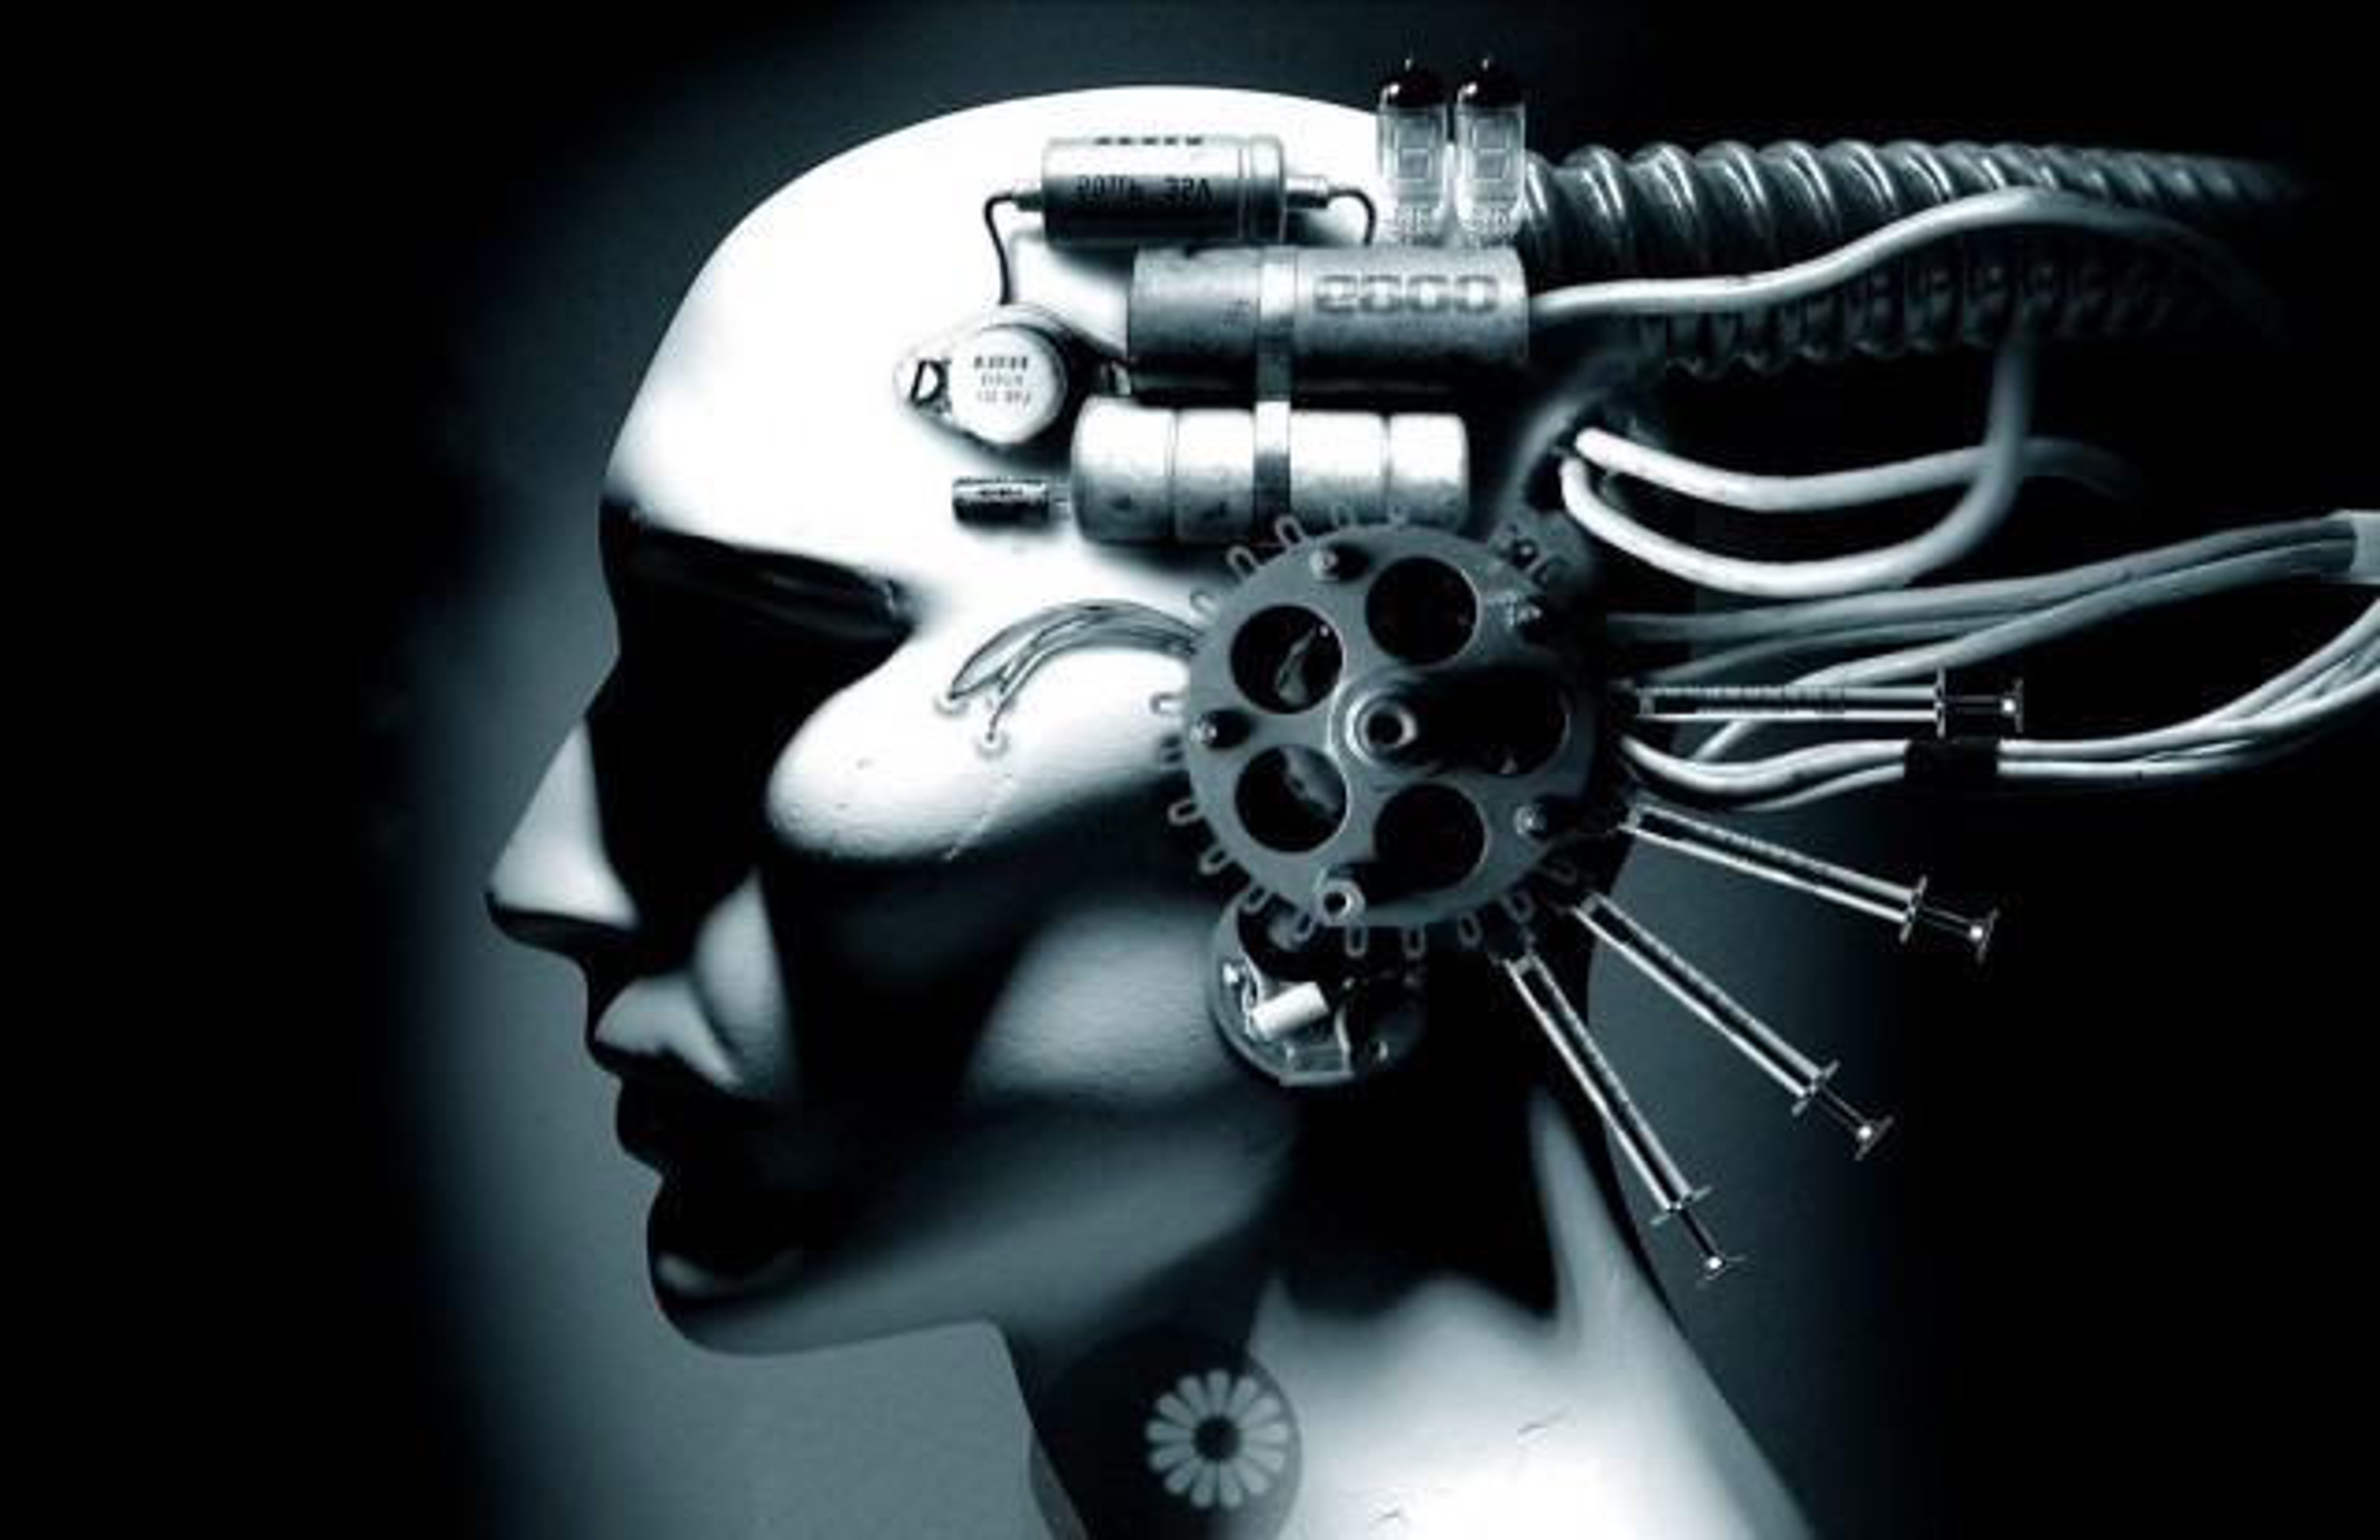 A cyberpunk/transhumanist, kinda